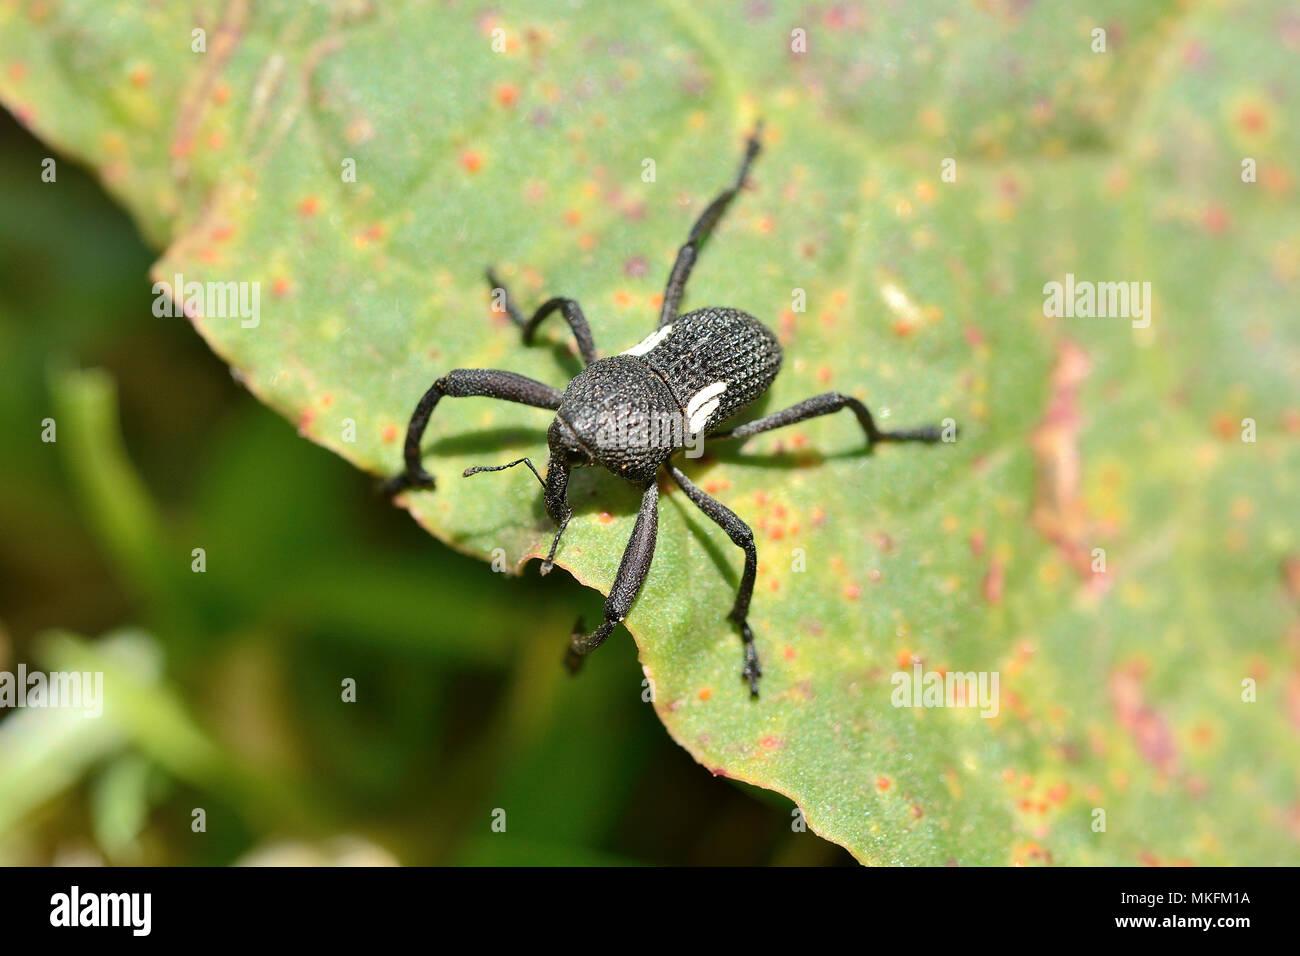 'Burrito' (Rhyephenes humeralis), Coleoptera Curculionidae, Vina del Mar, V Region of Valparaiso, Chile - Stock Image